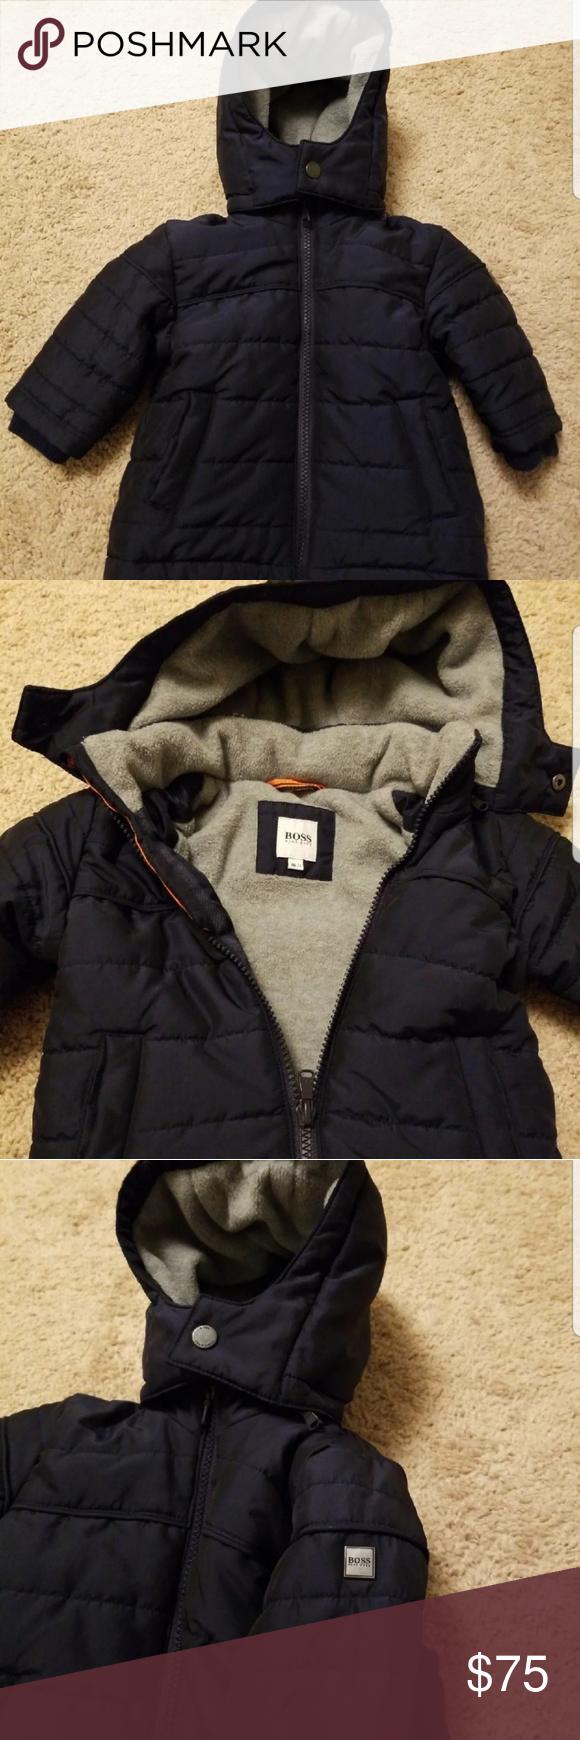 cf30c6168 Hugo Boss Puffer coat